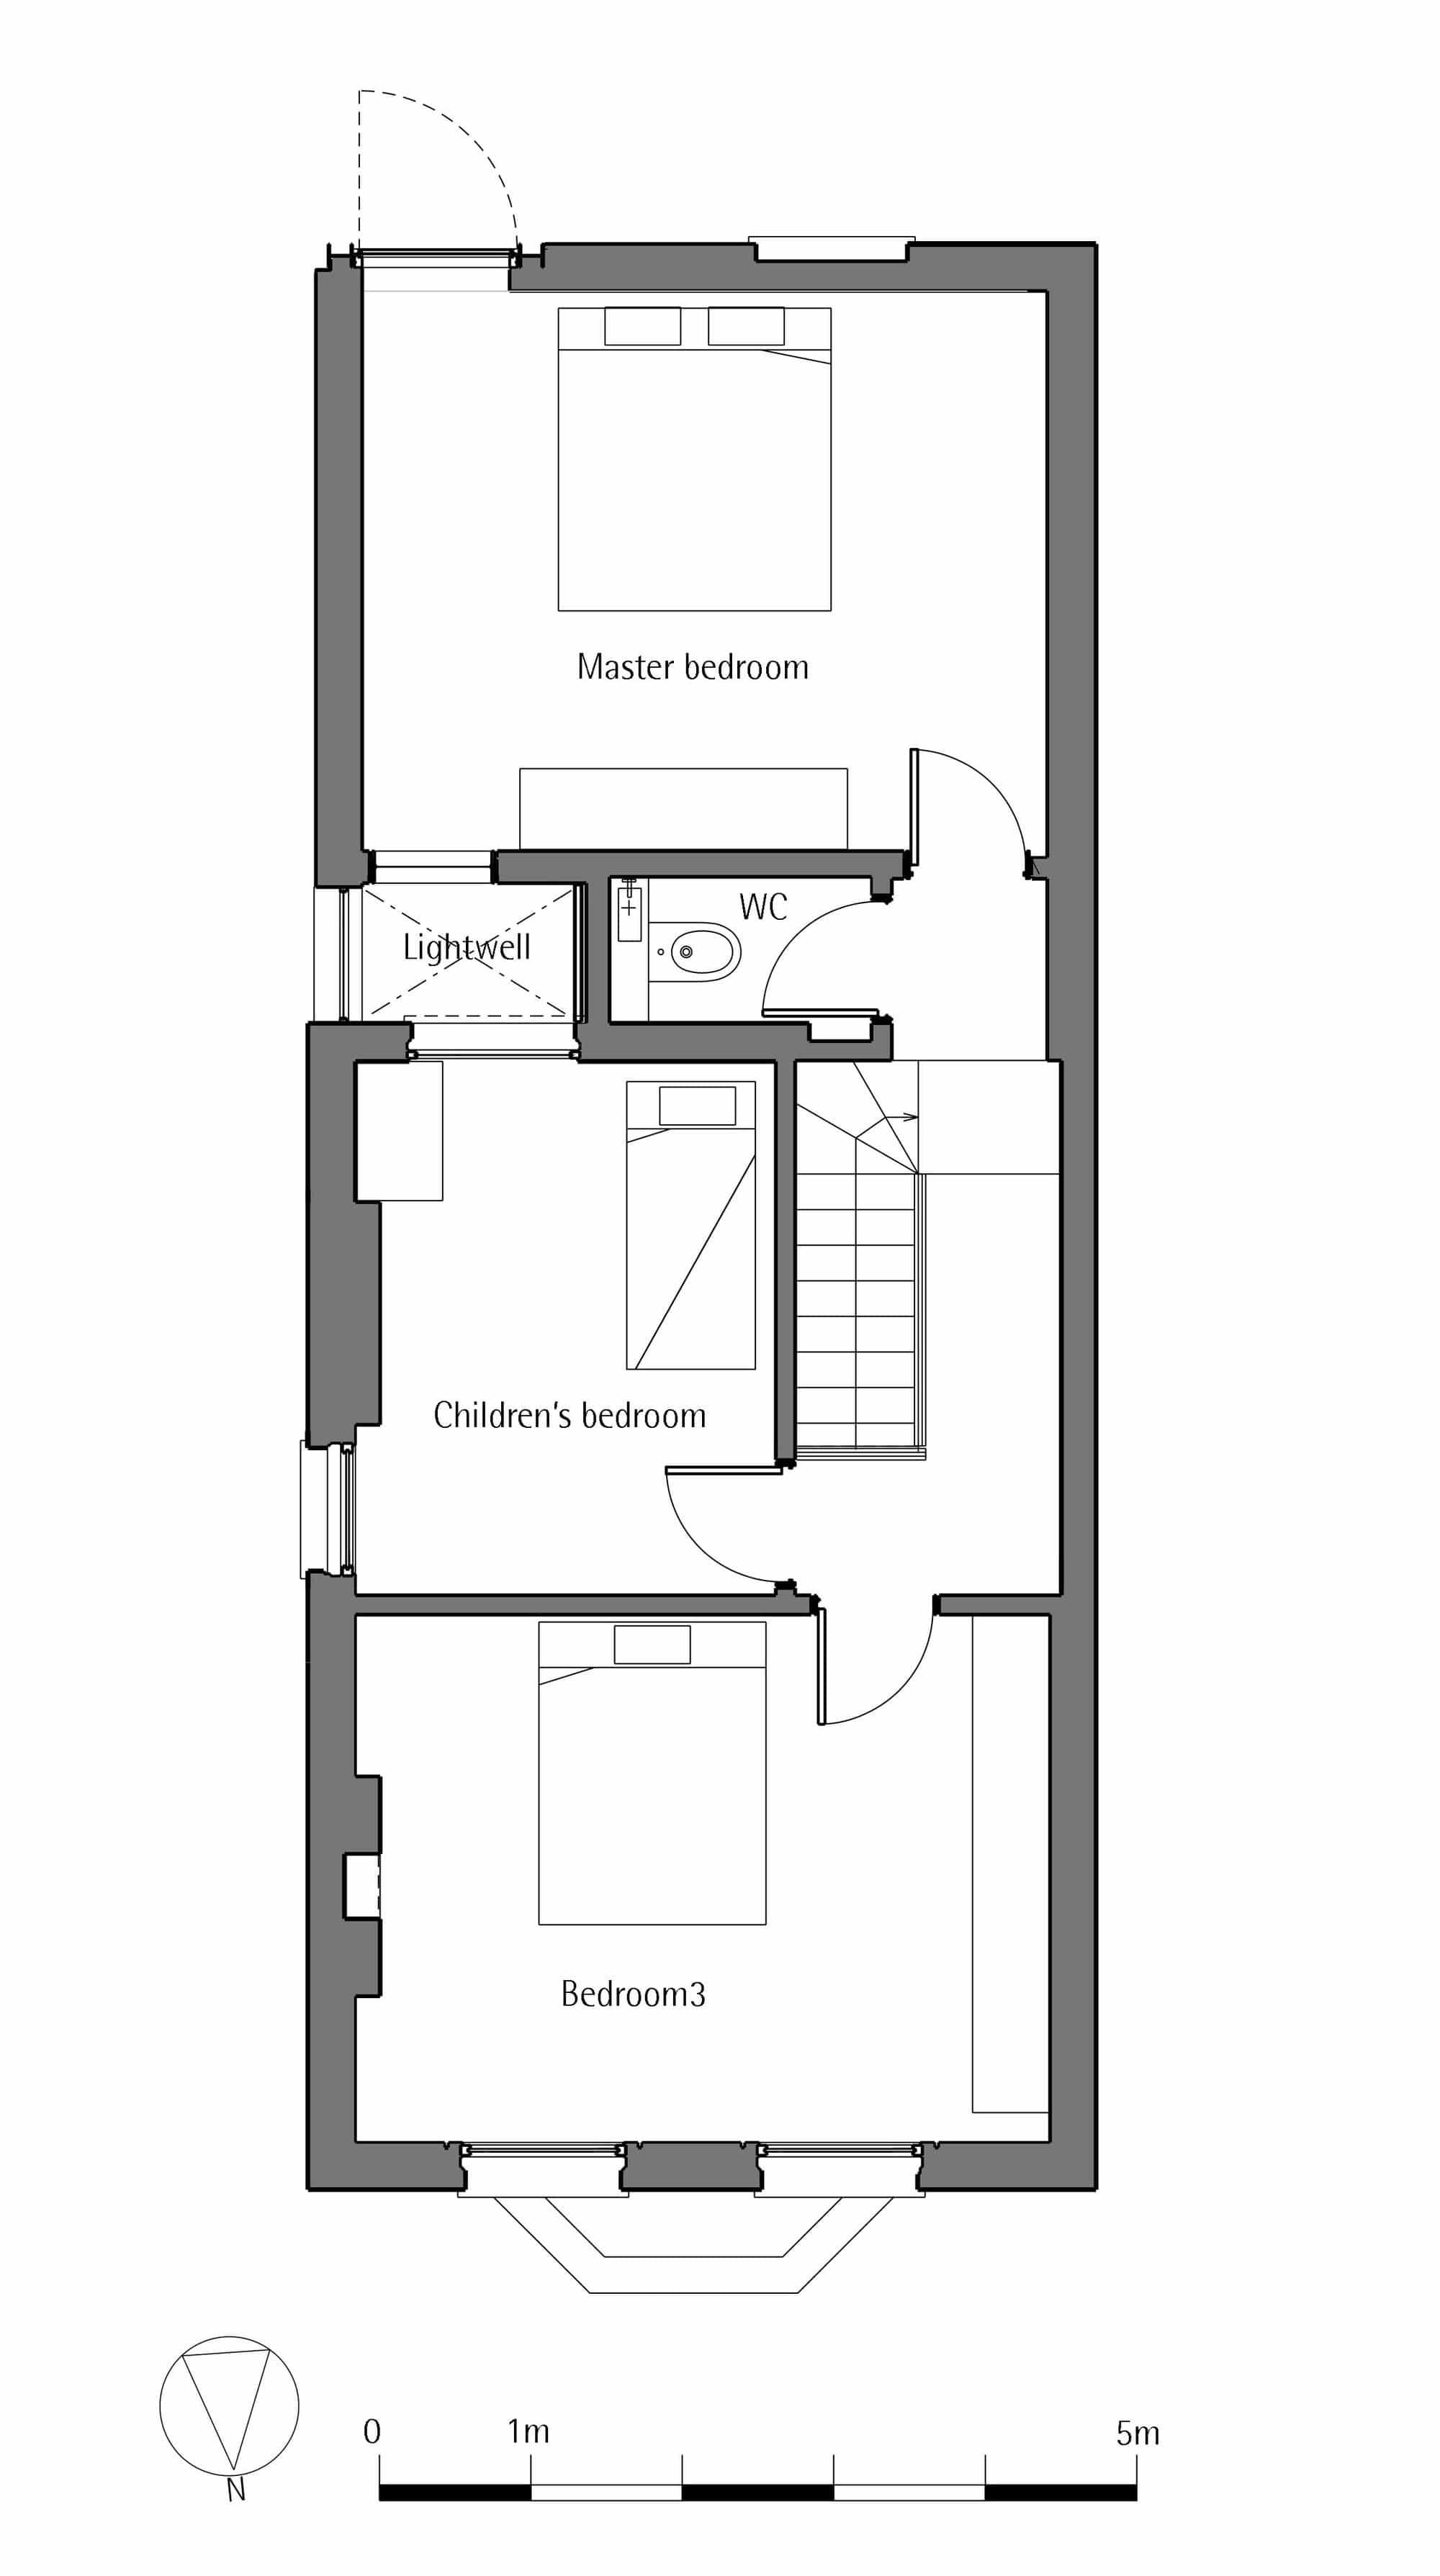 Dise o de casa de dos pisos peque a construye hogar for Plano de pieza cocina y bano